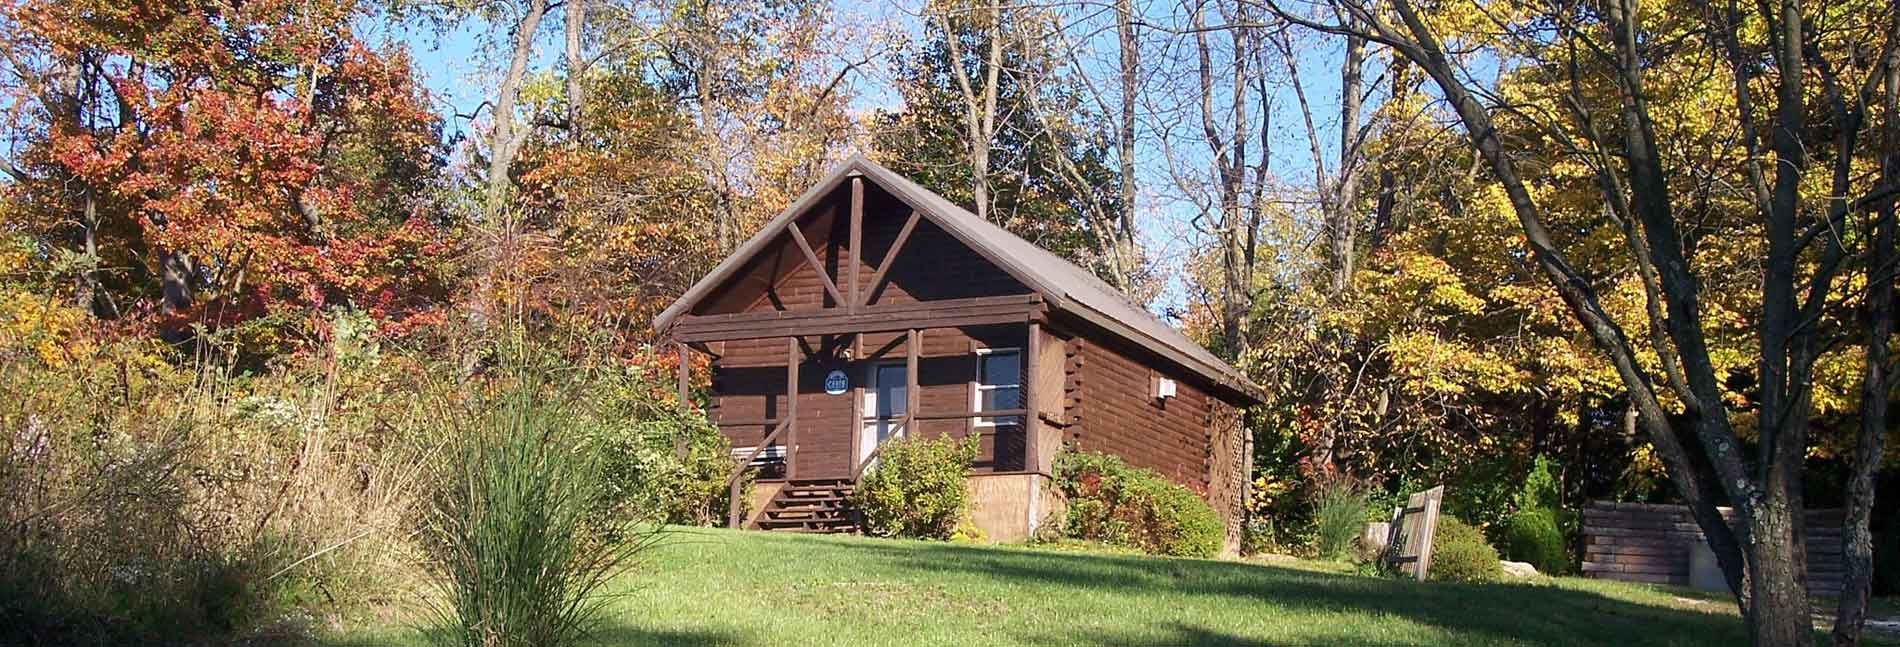 cabin_fall-1